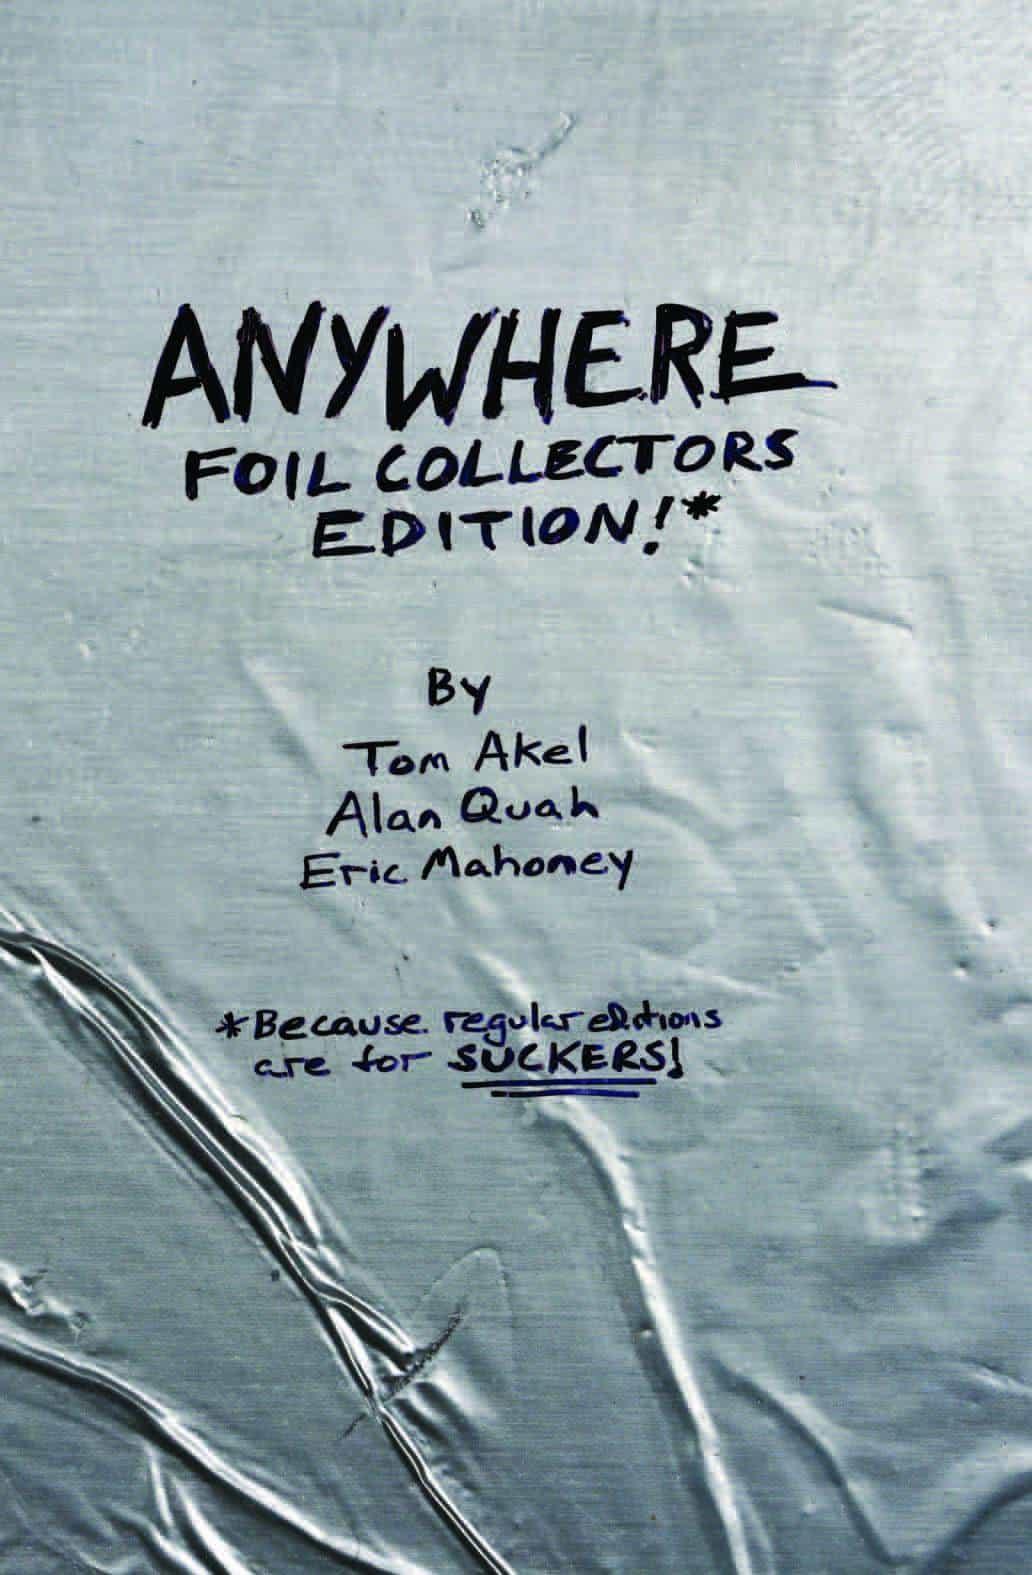 Anywhere 2